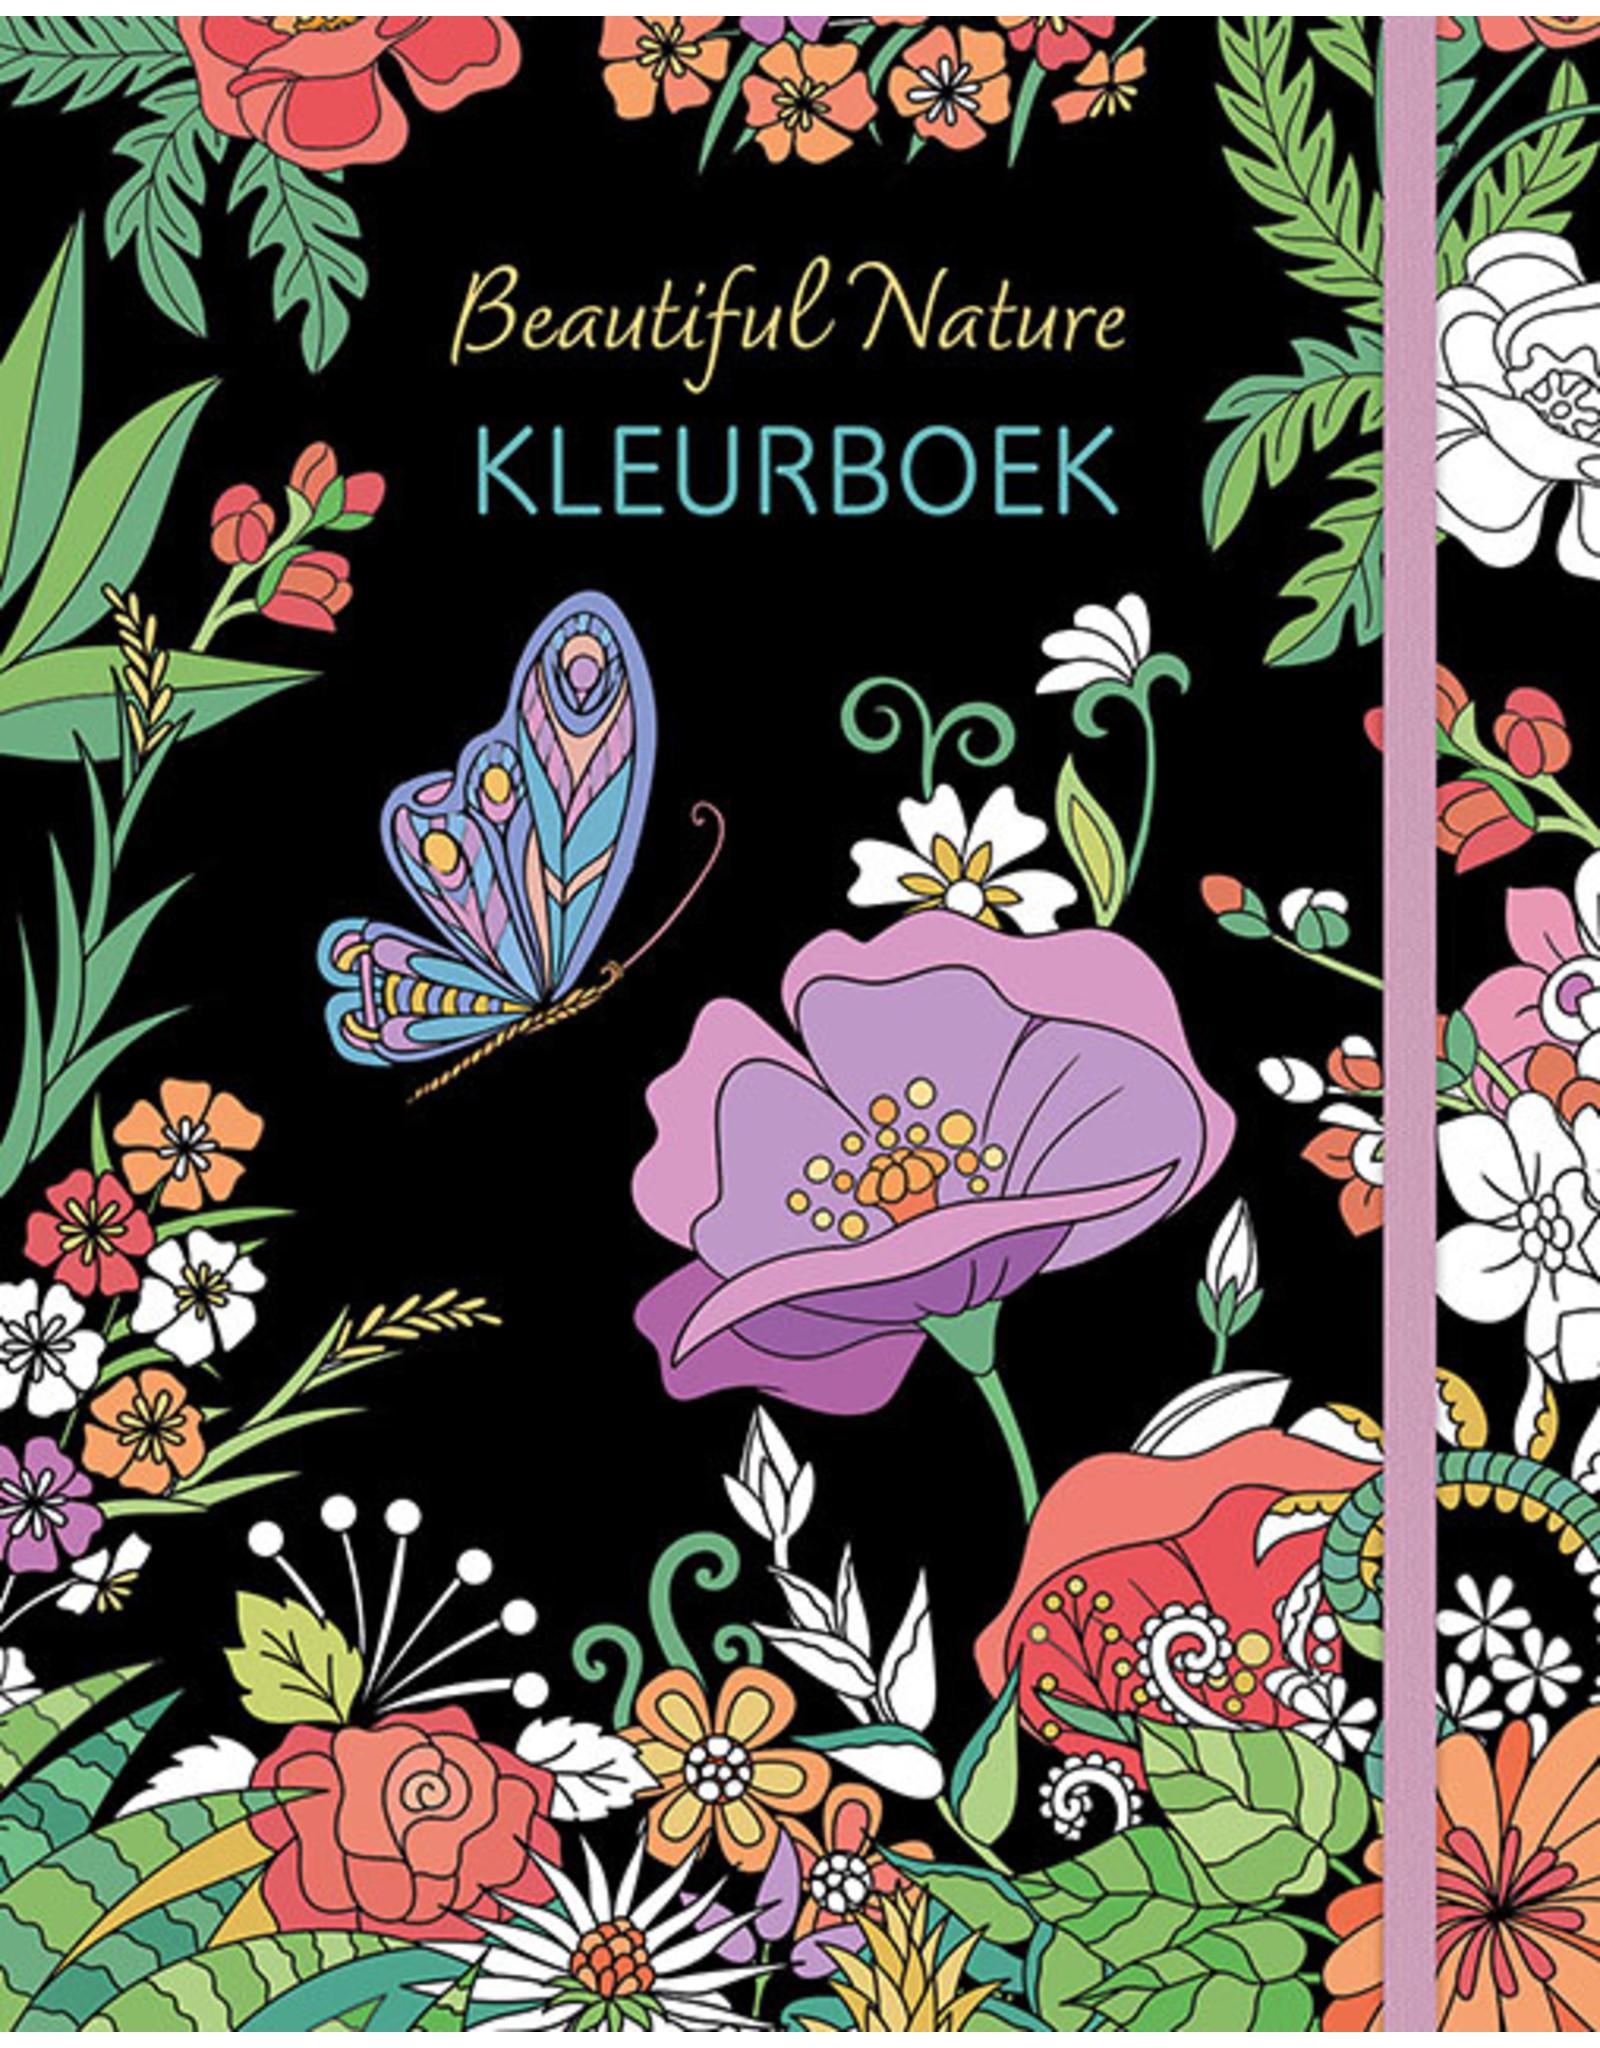 Deltas Beautiful Nature Kleurboek